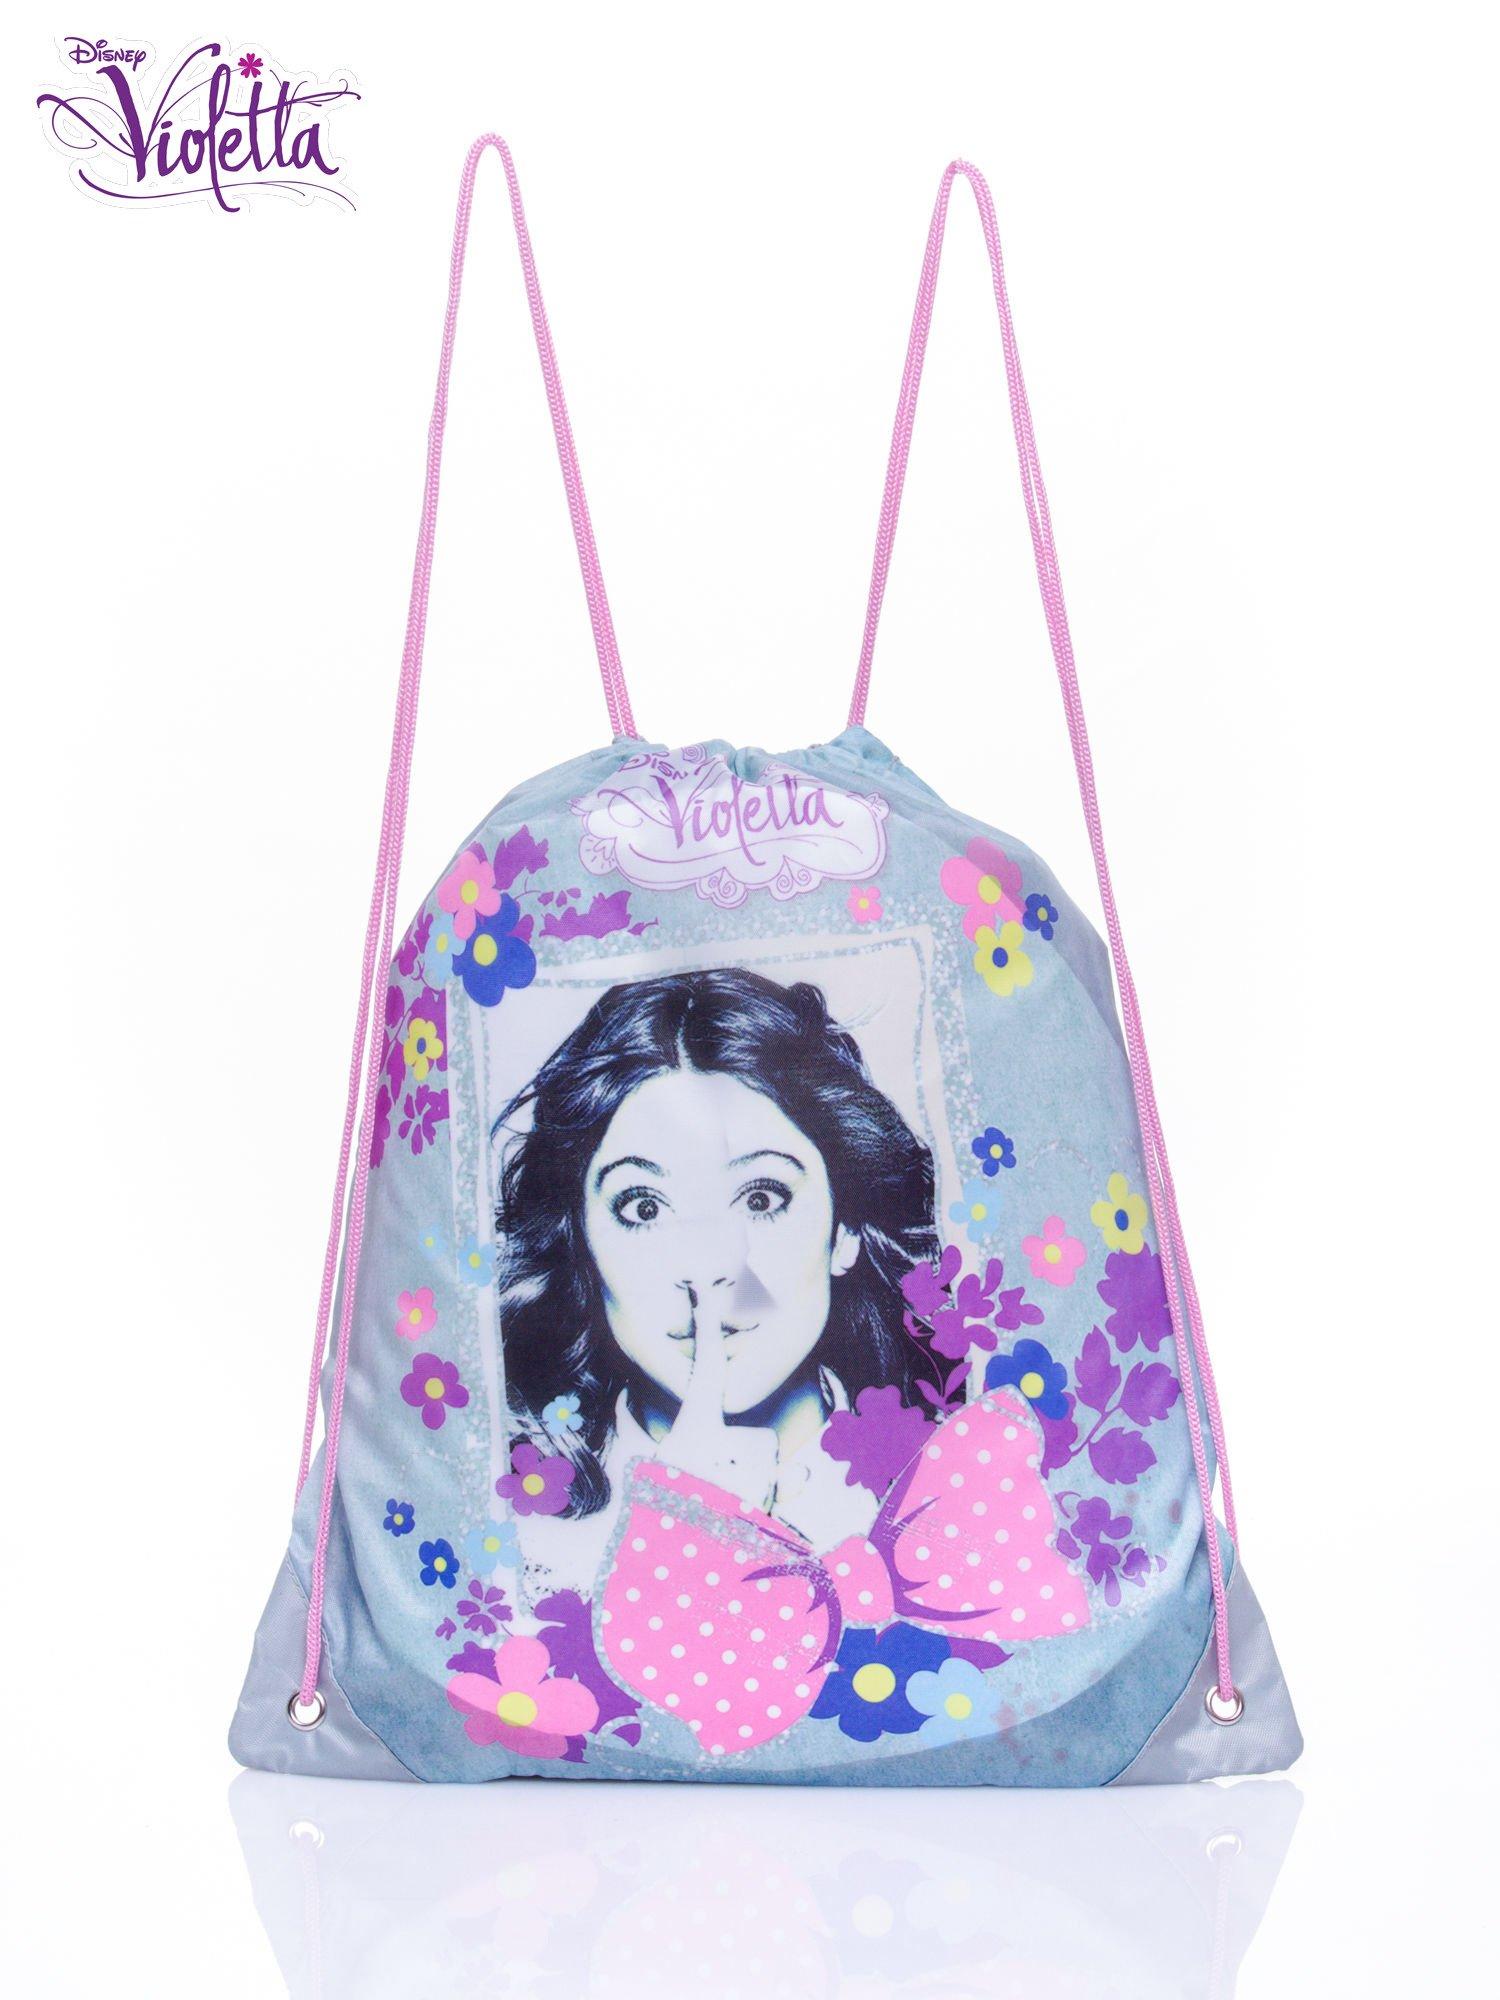 Niebieski plecak worek DISNEY Violetta                                  zdj.                                  1